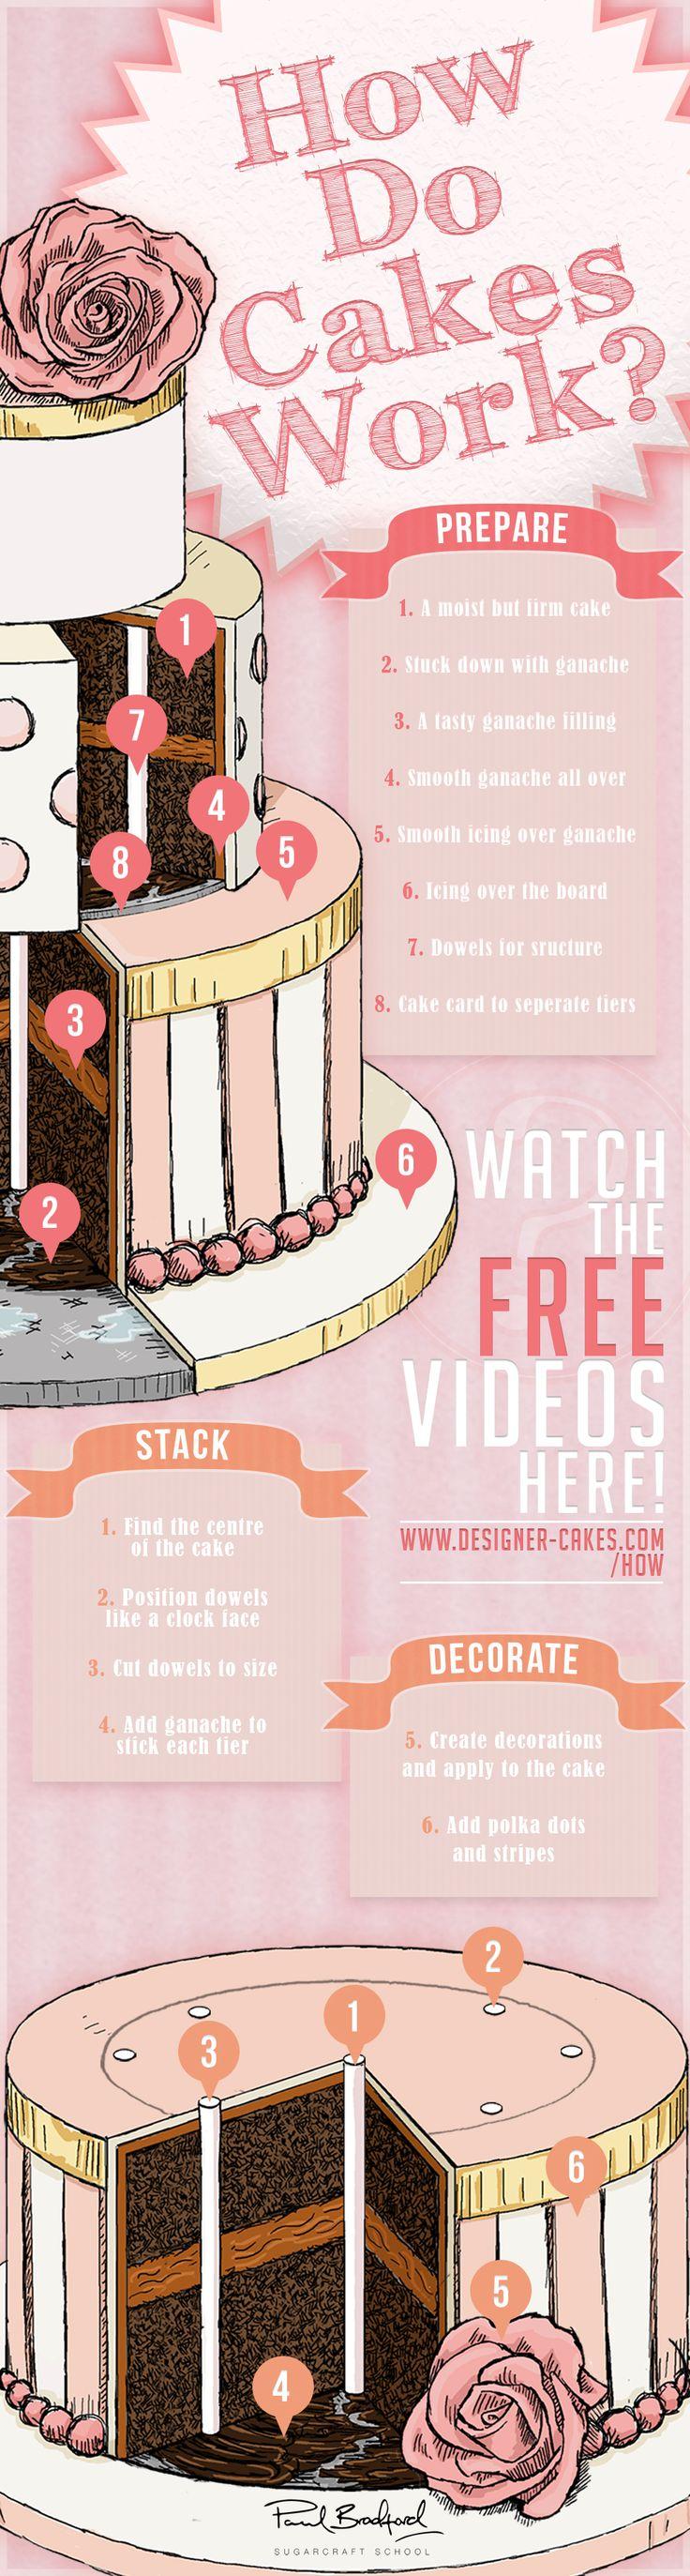 Best 25+ Cake decorating videos ideas on Pinterest | Cake videos ...